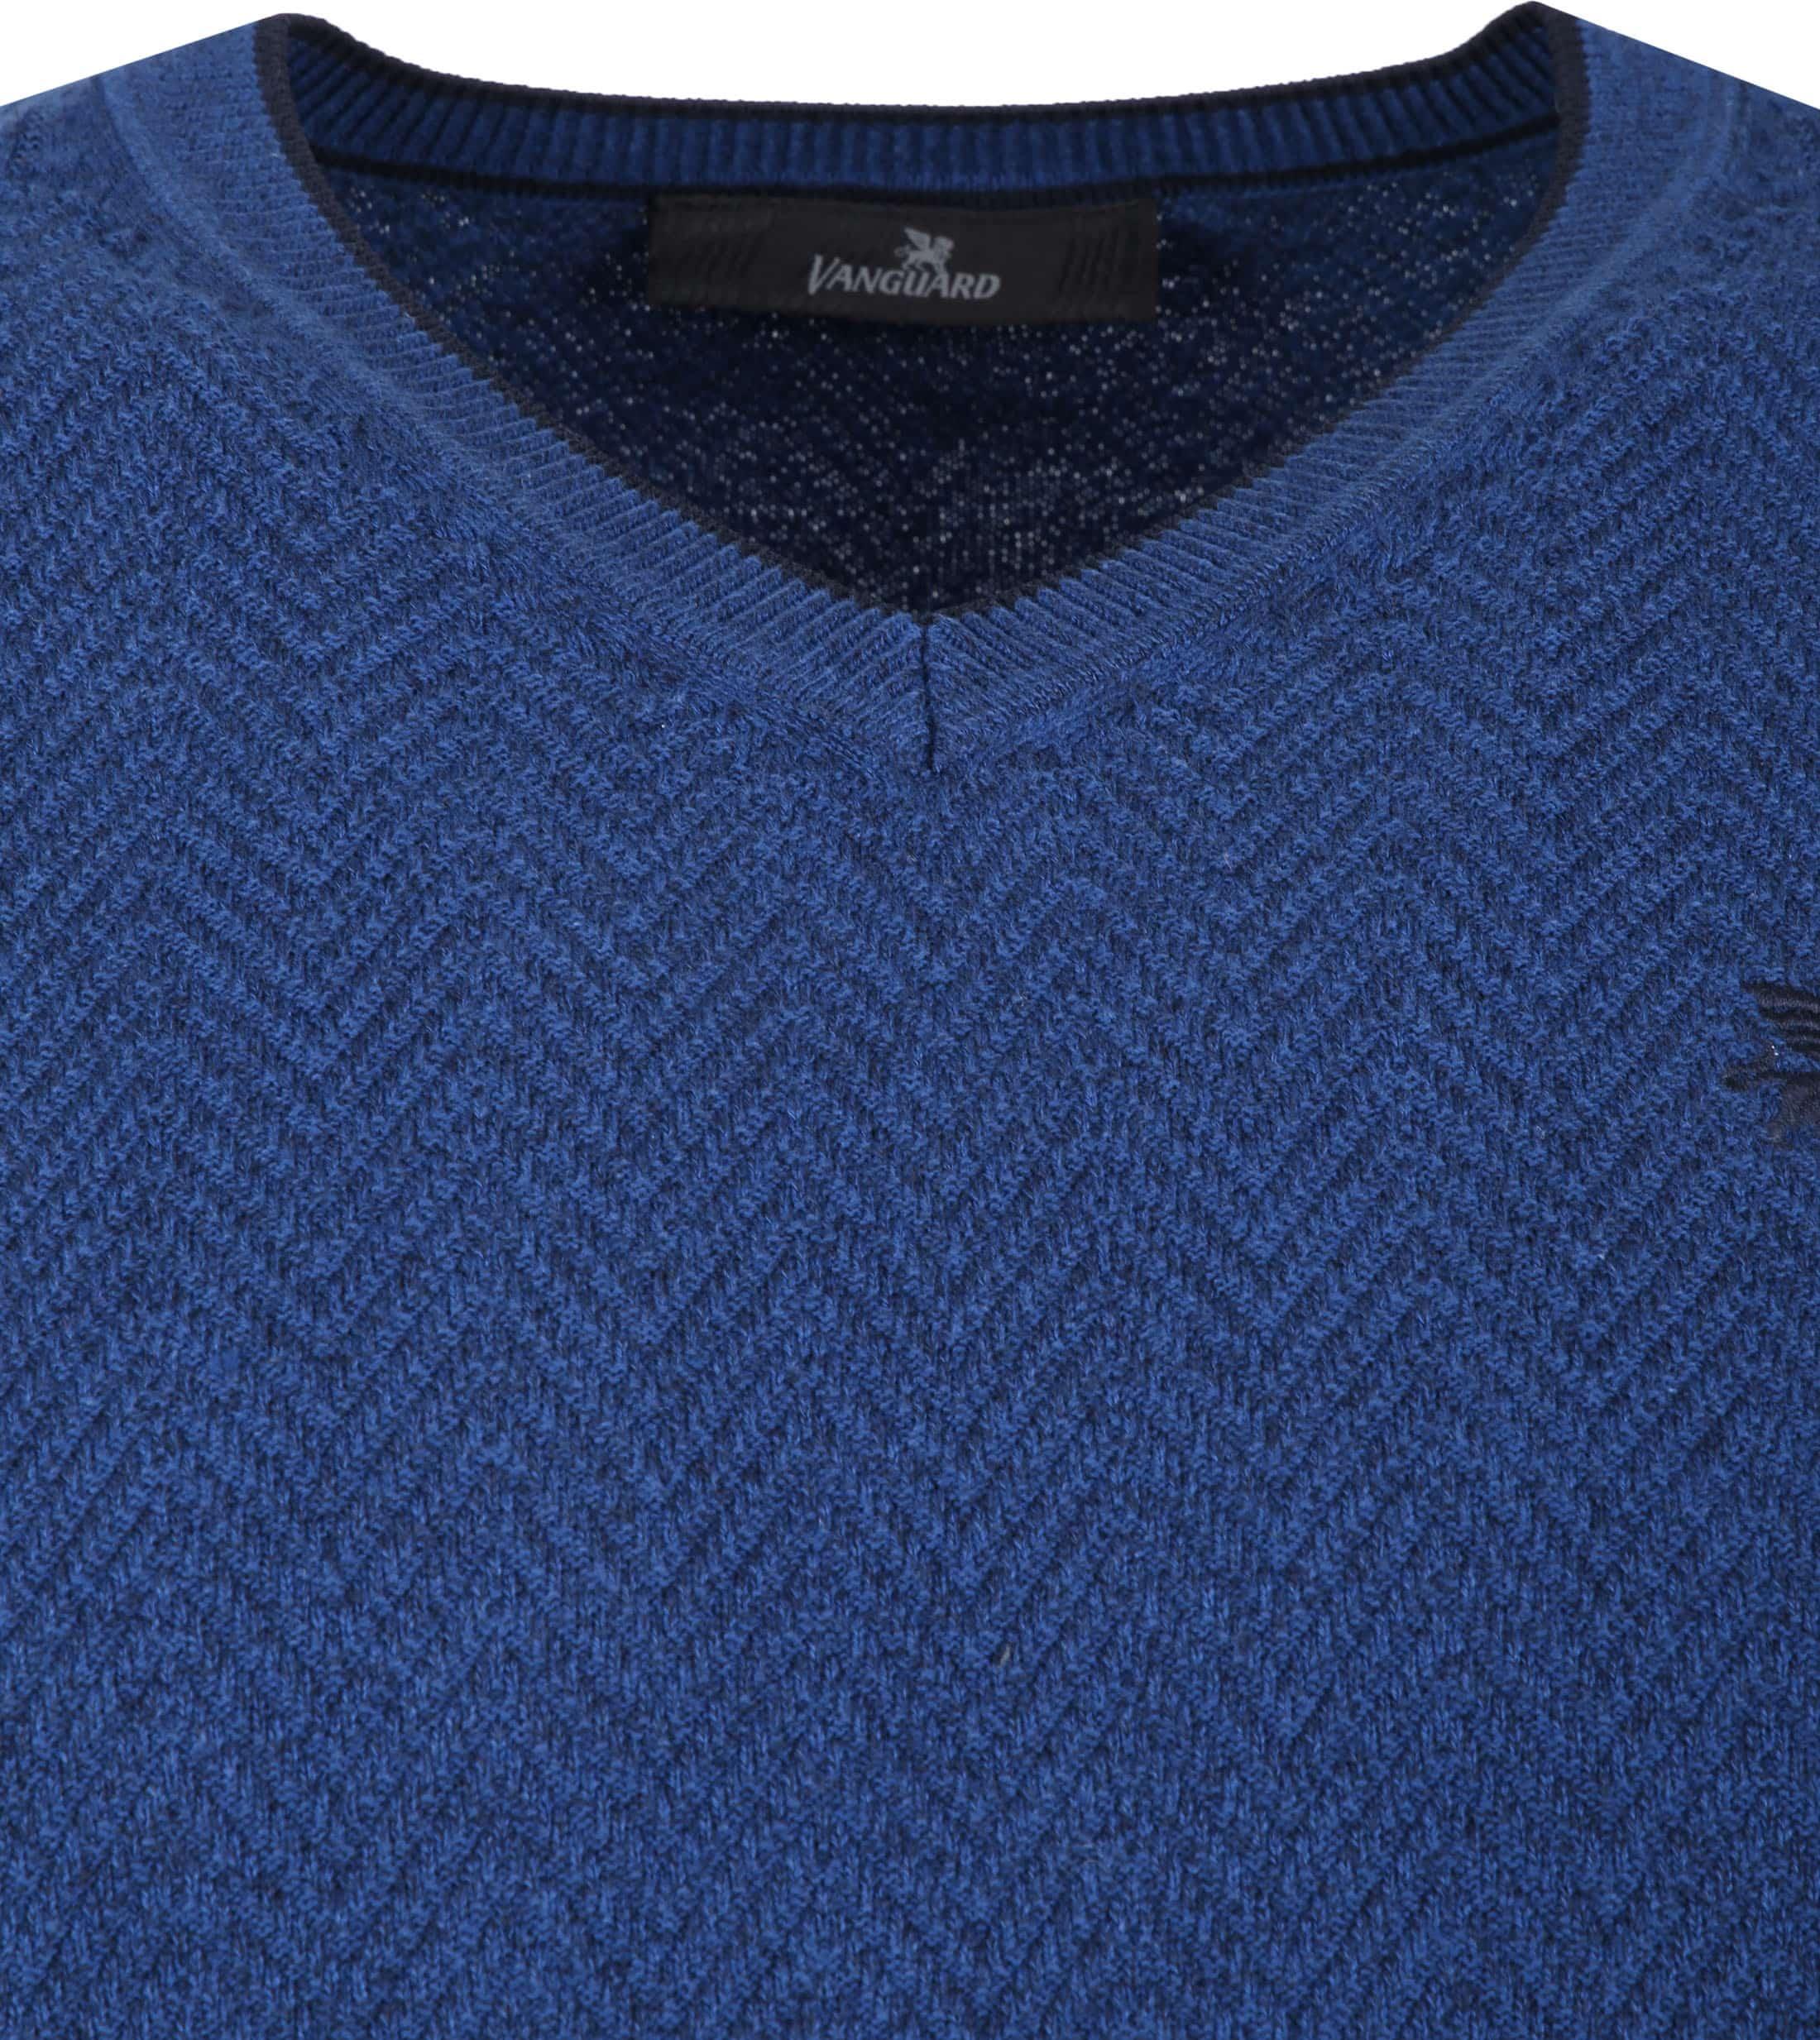 Vanguard Pullover Blue foto 1